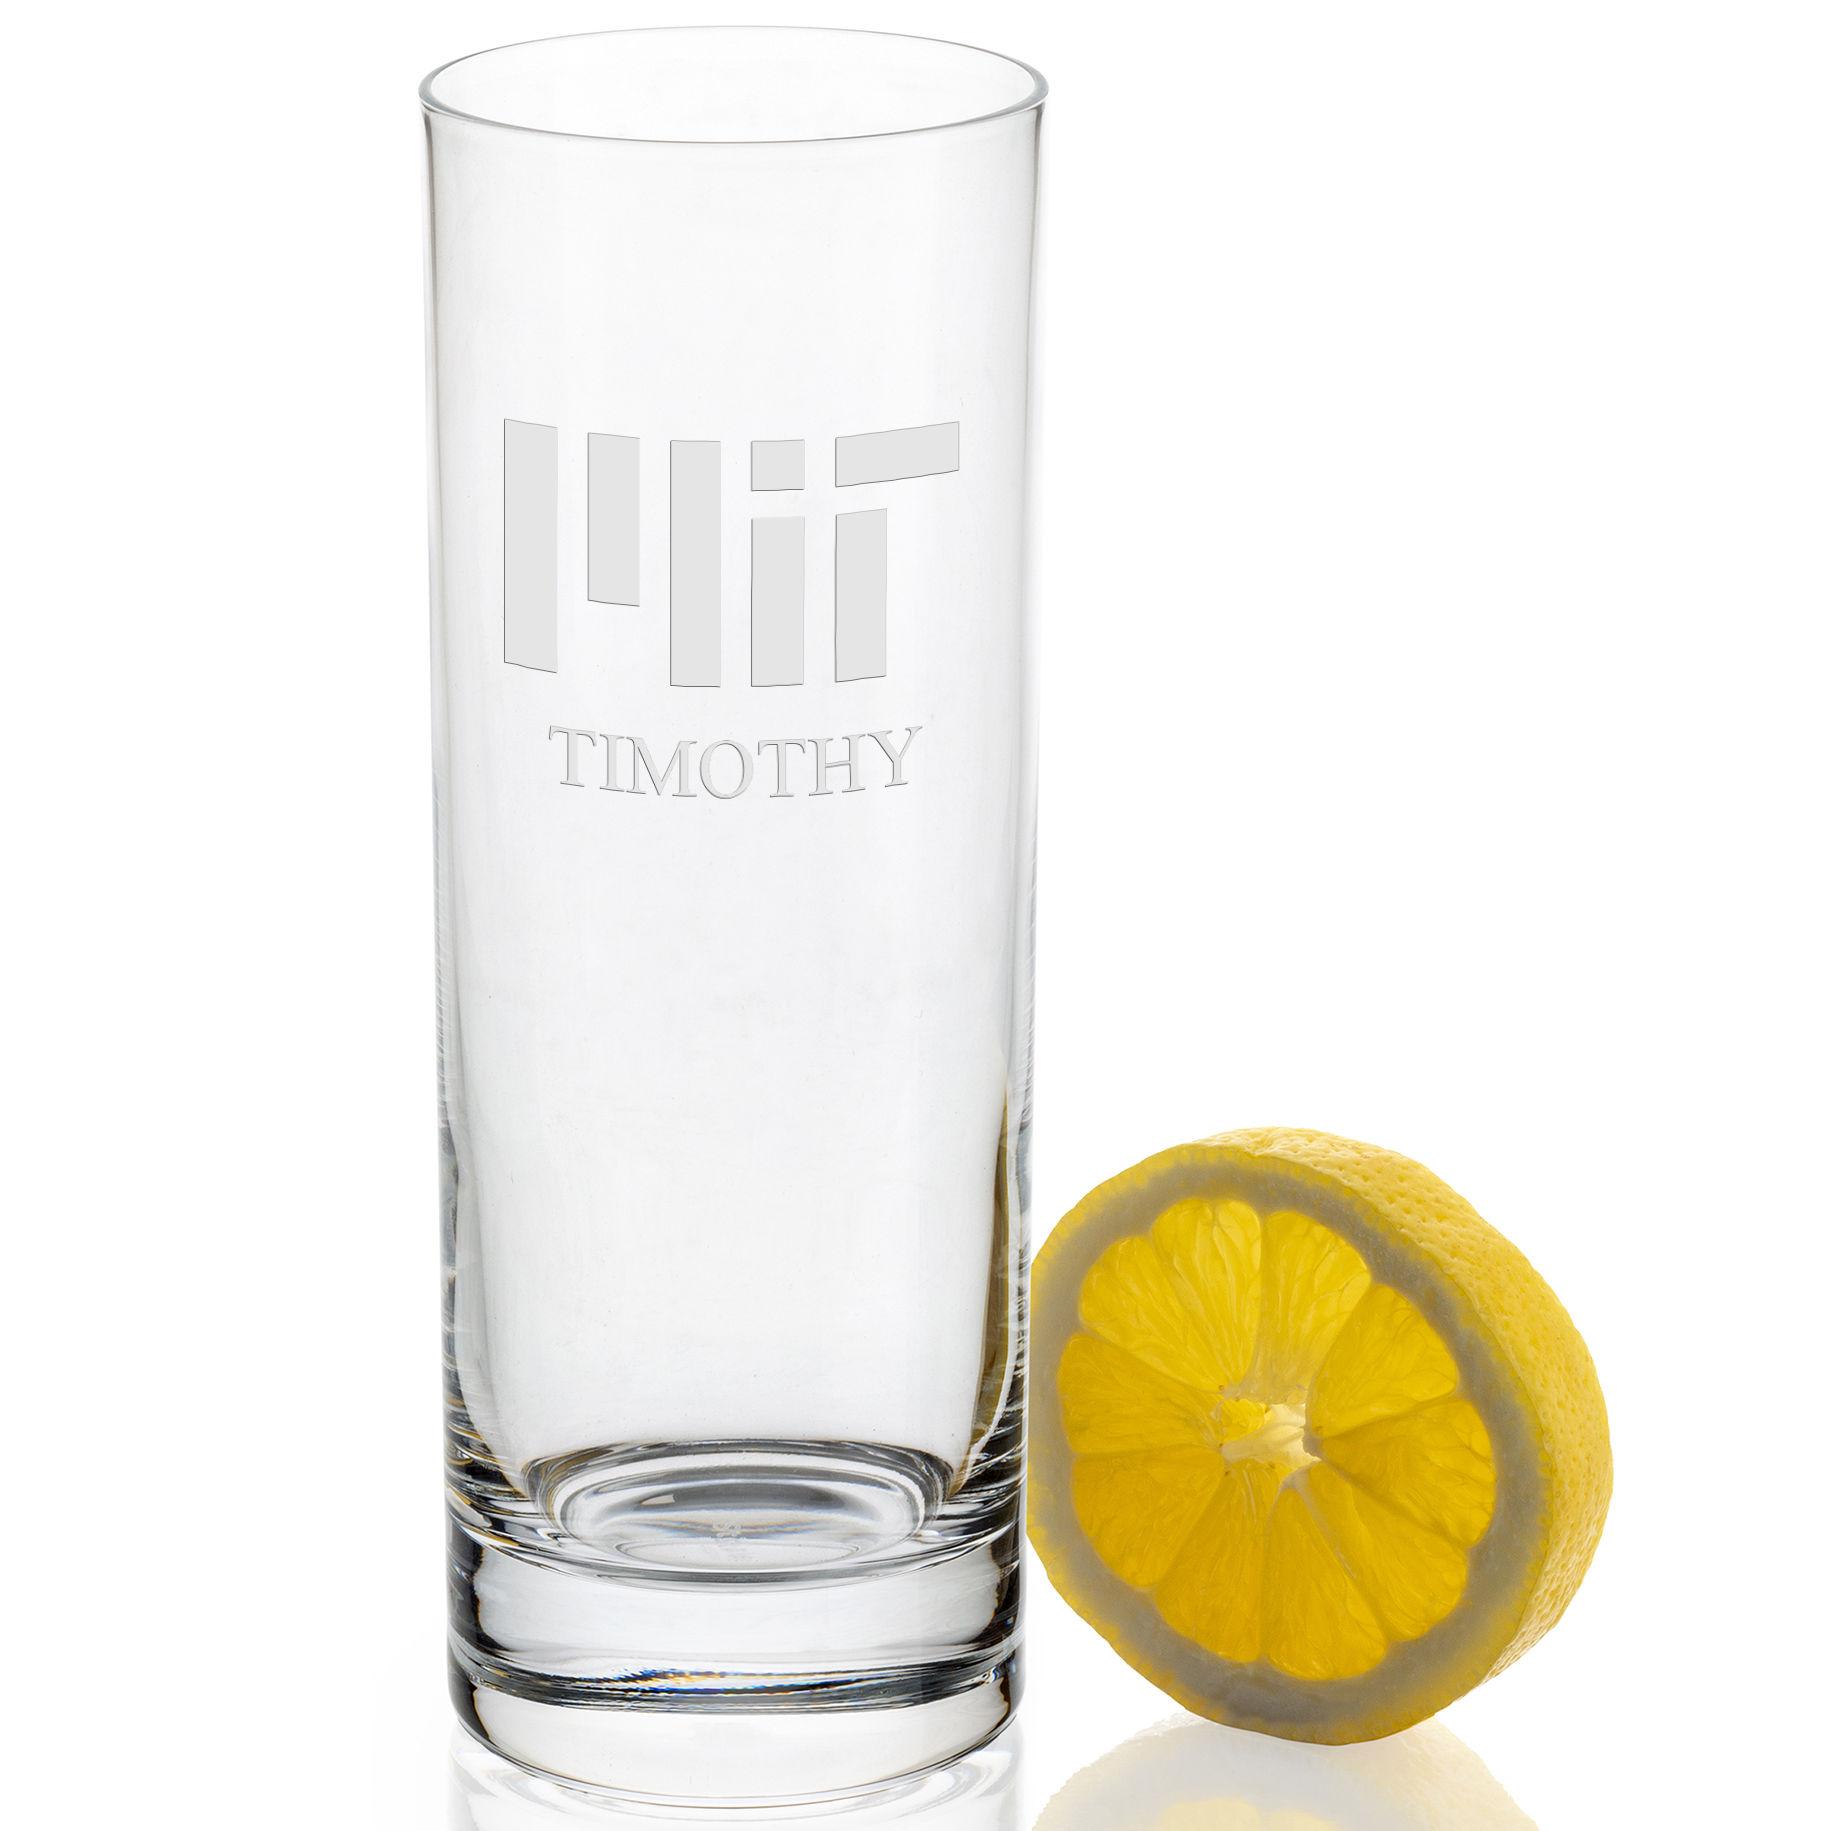 MIT Iced Beverage Glasses - Set of 2 - Image 2